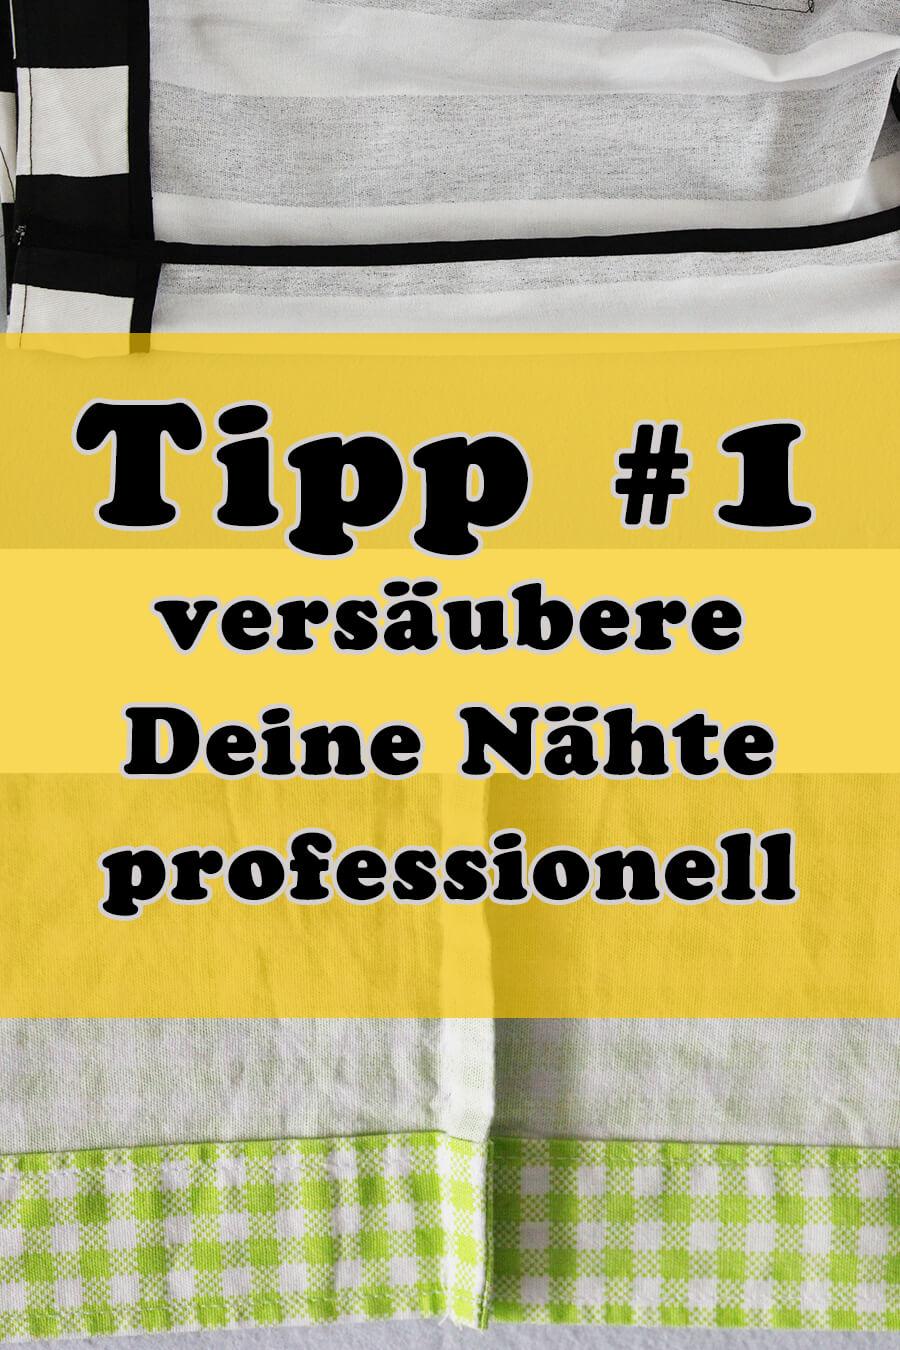 Tipp 1 professionell versäubern